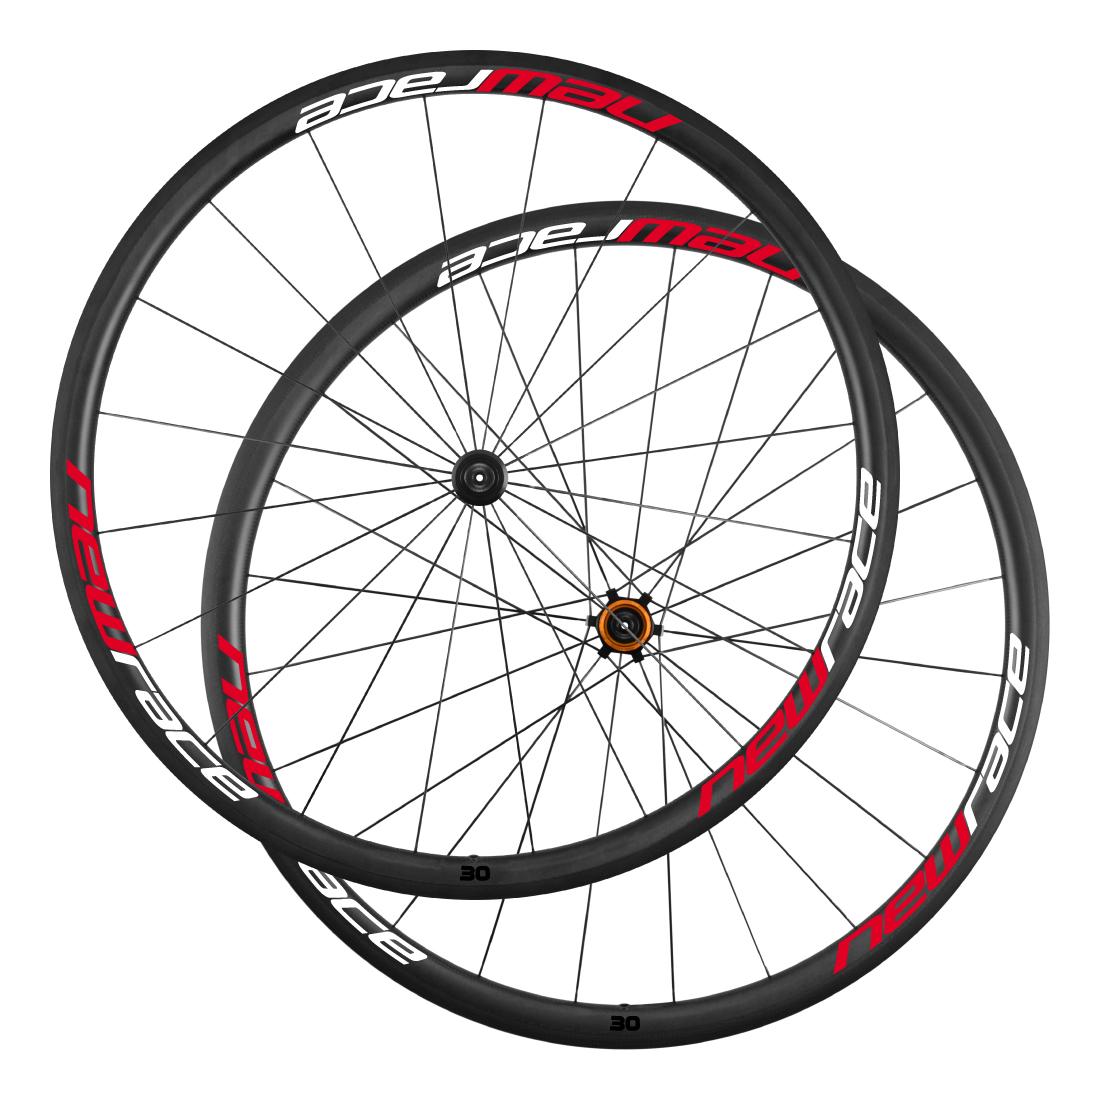 Rodas New Race Carbon 30 / pneu